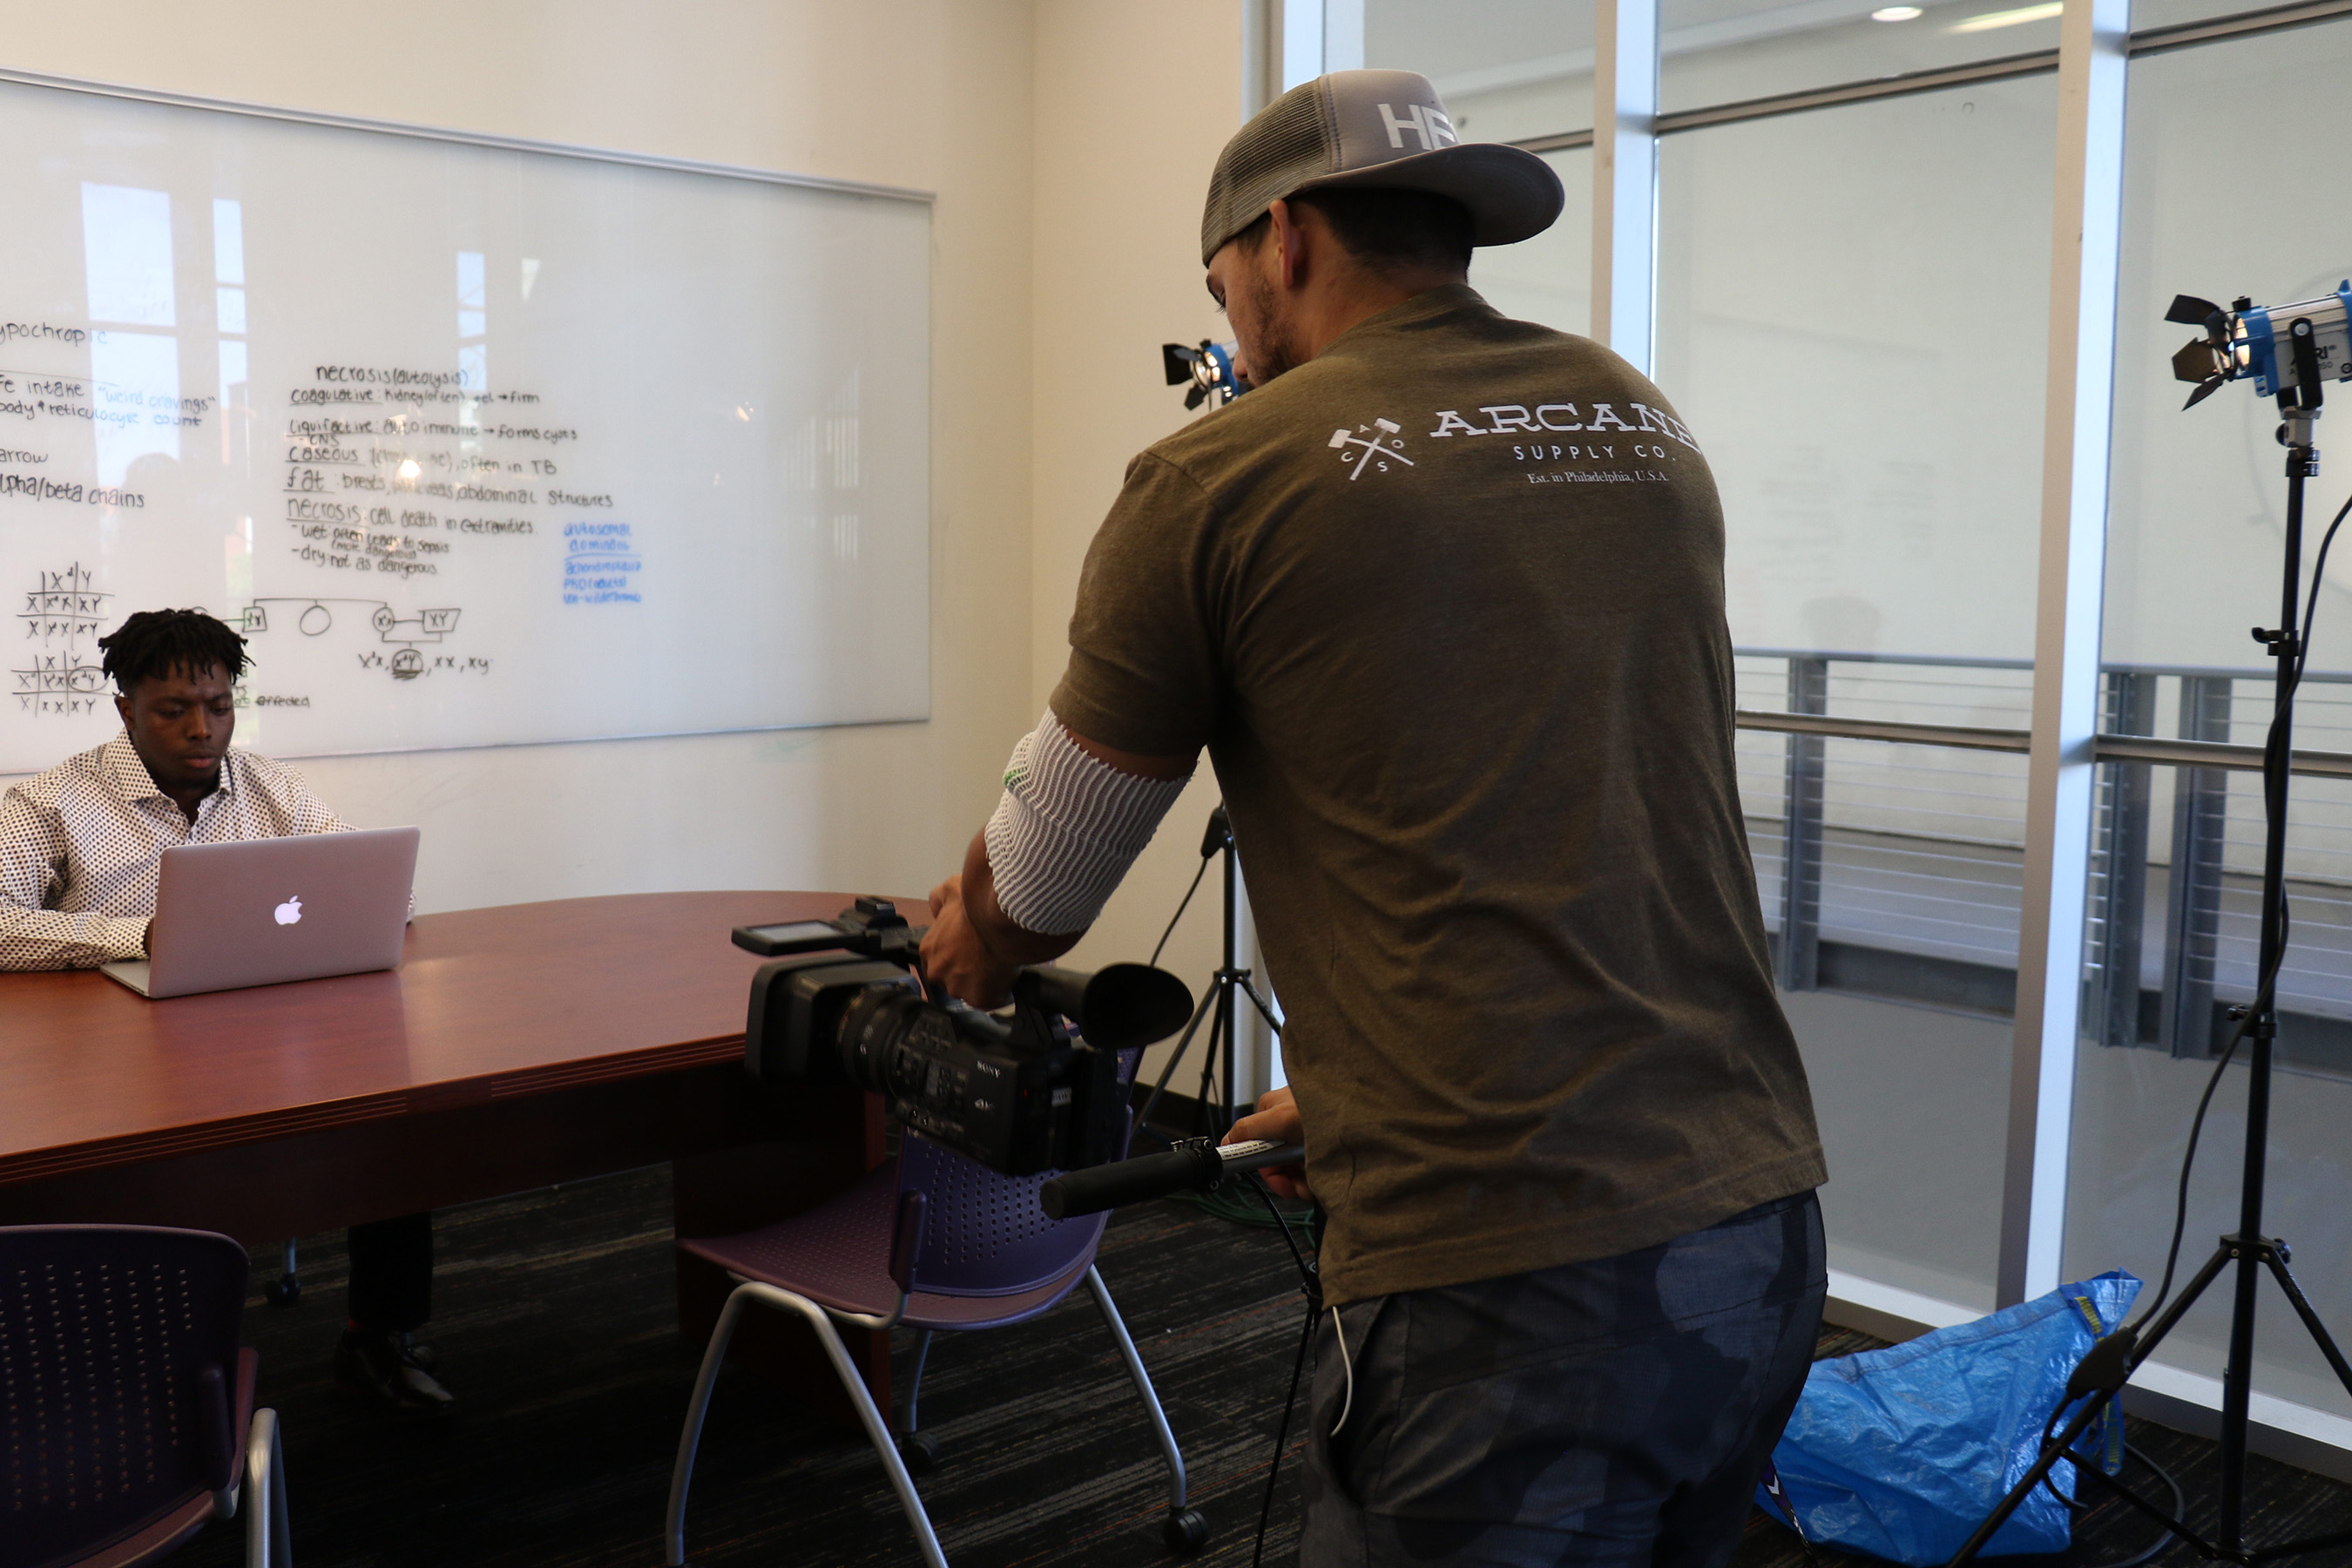 Explore the art of screenwriting and storytelling in GCU's digital film program.